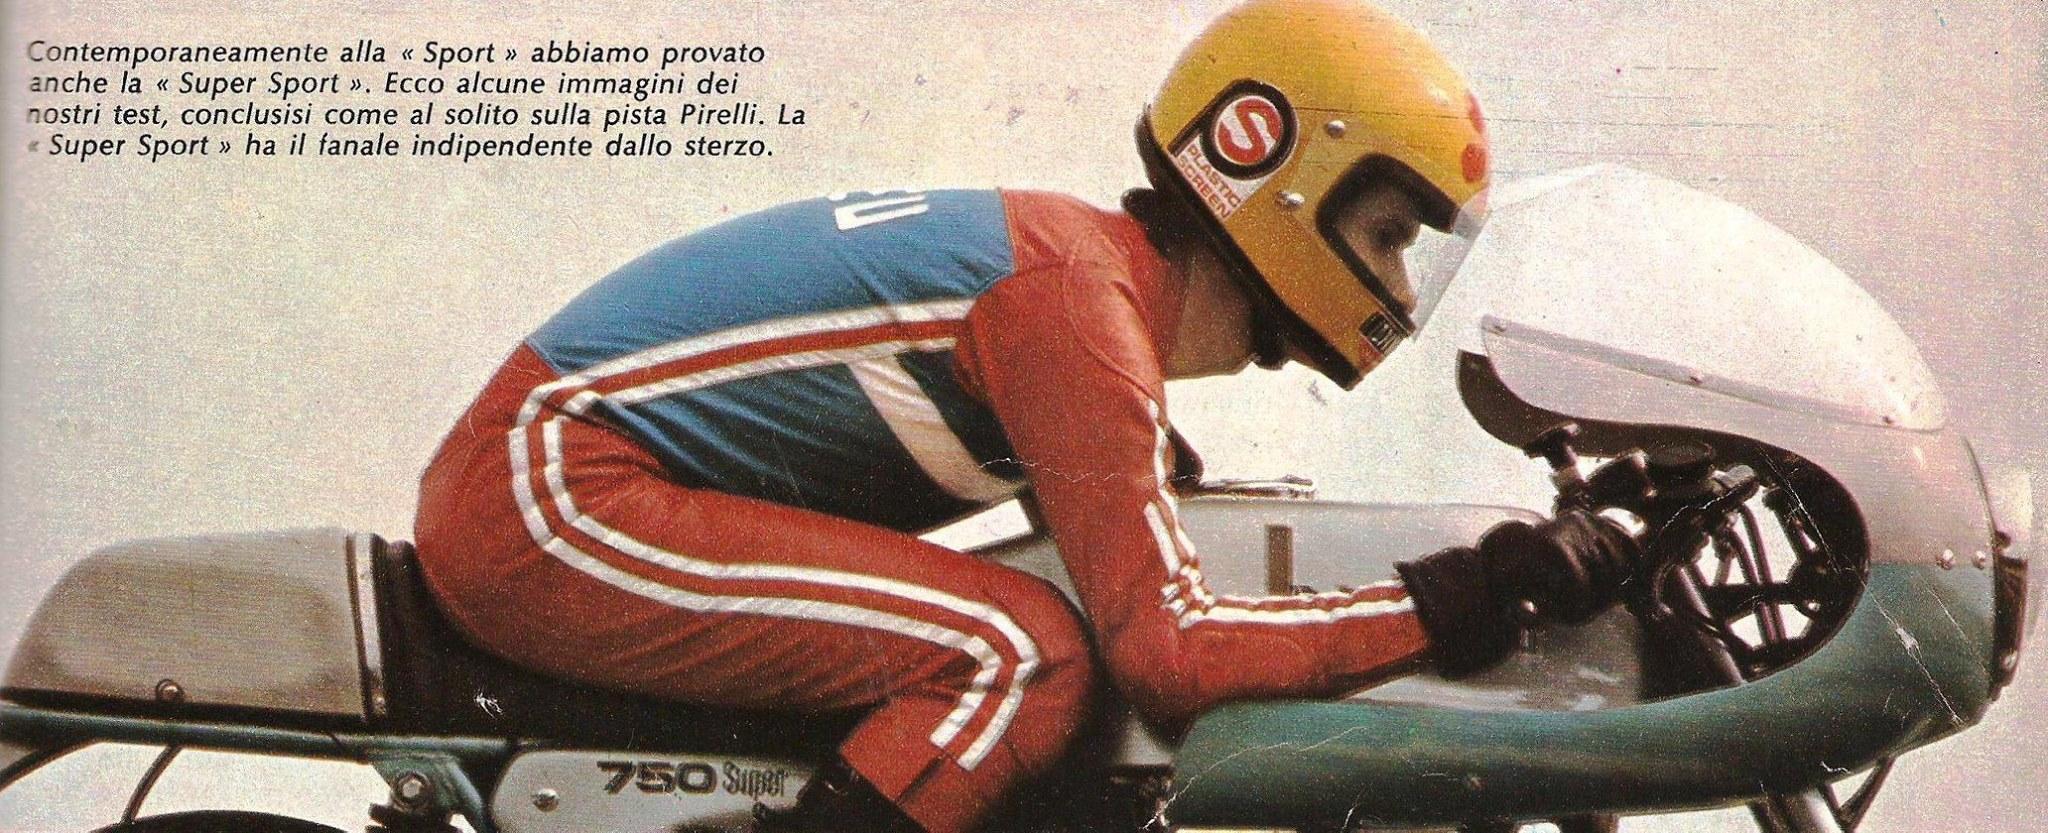 ESPERIENZE DIRETTE: Giancarlo Daneu, pilota Segoni Special